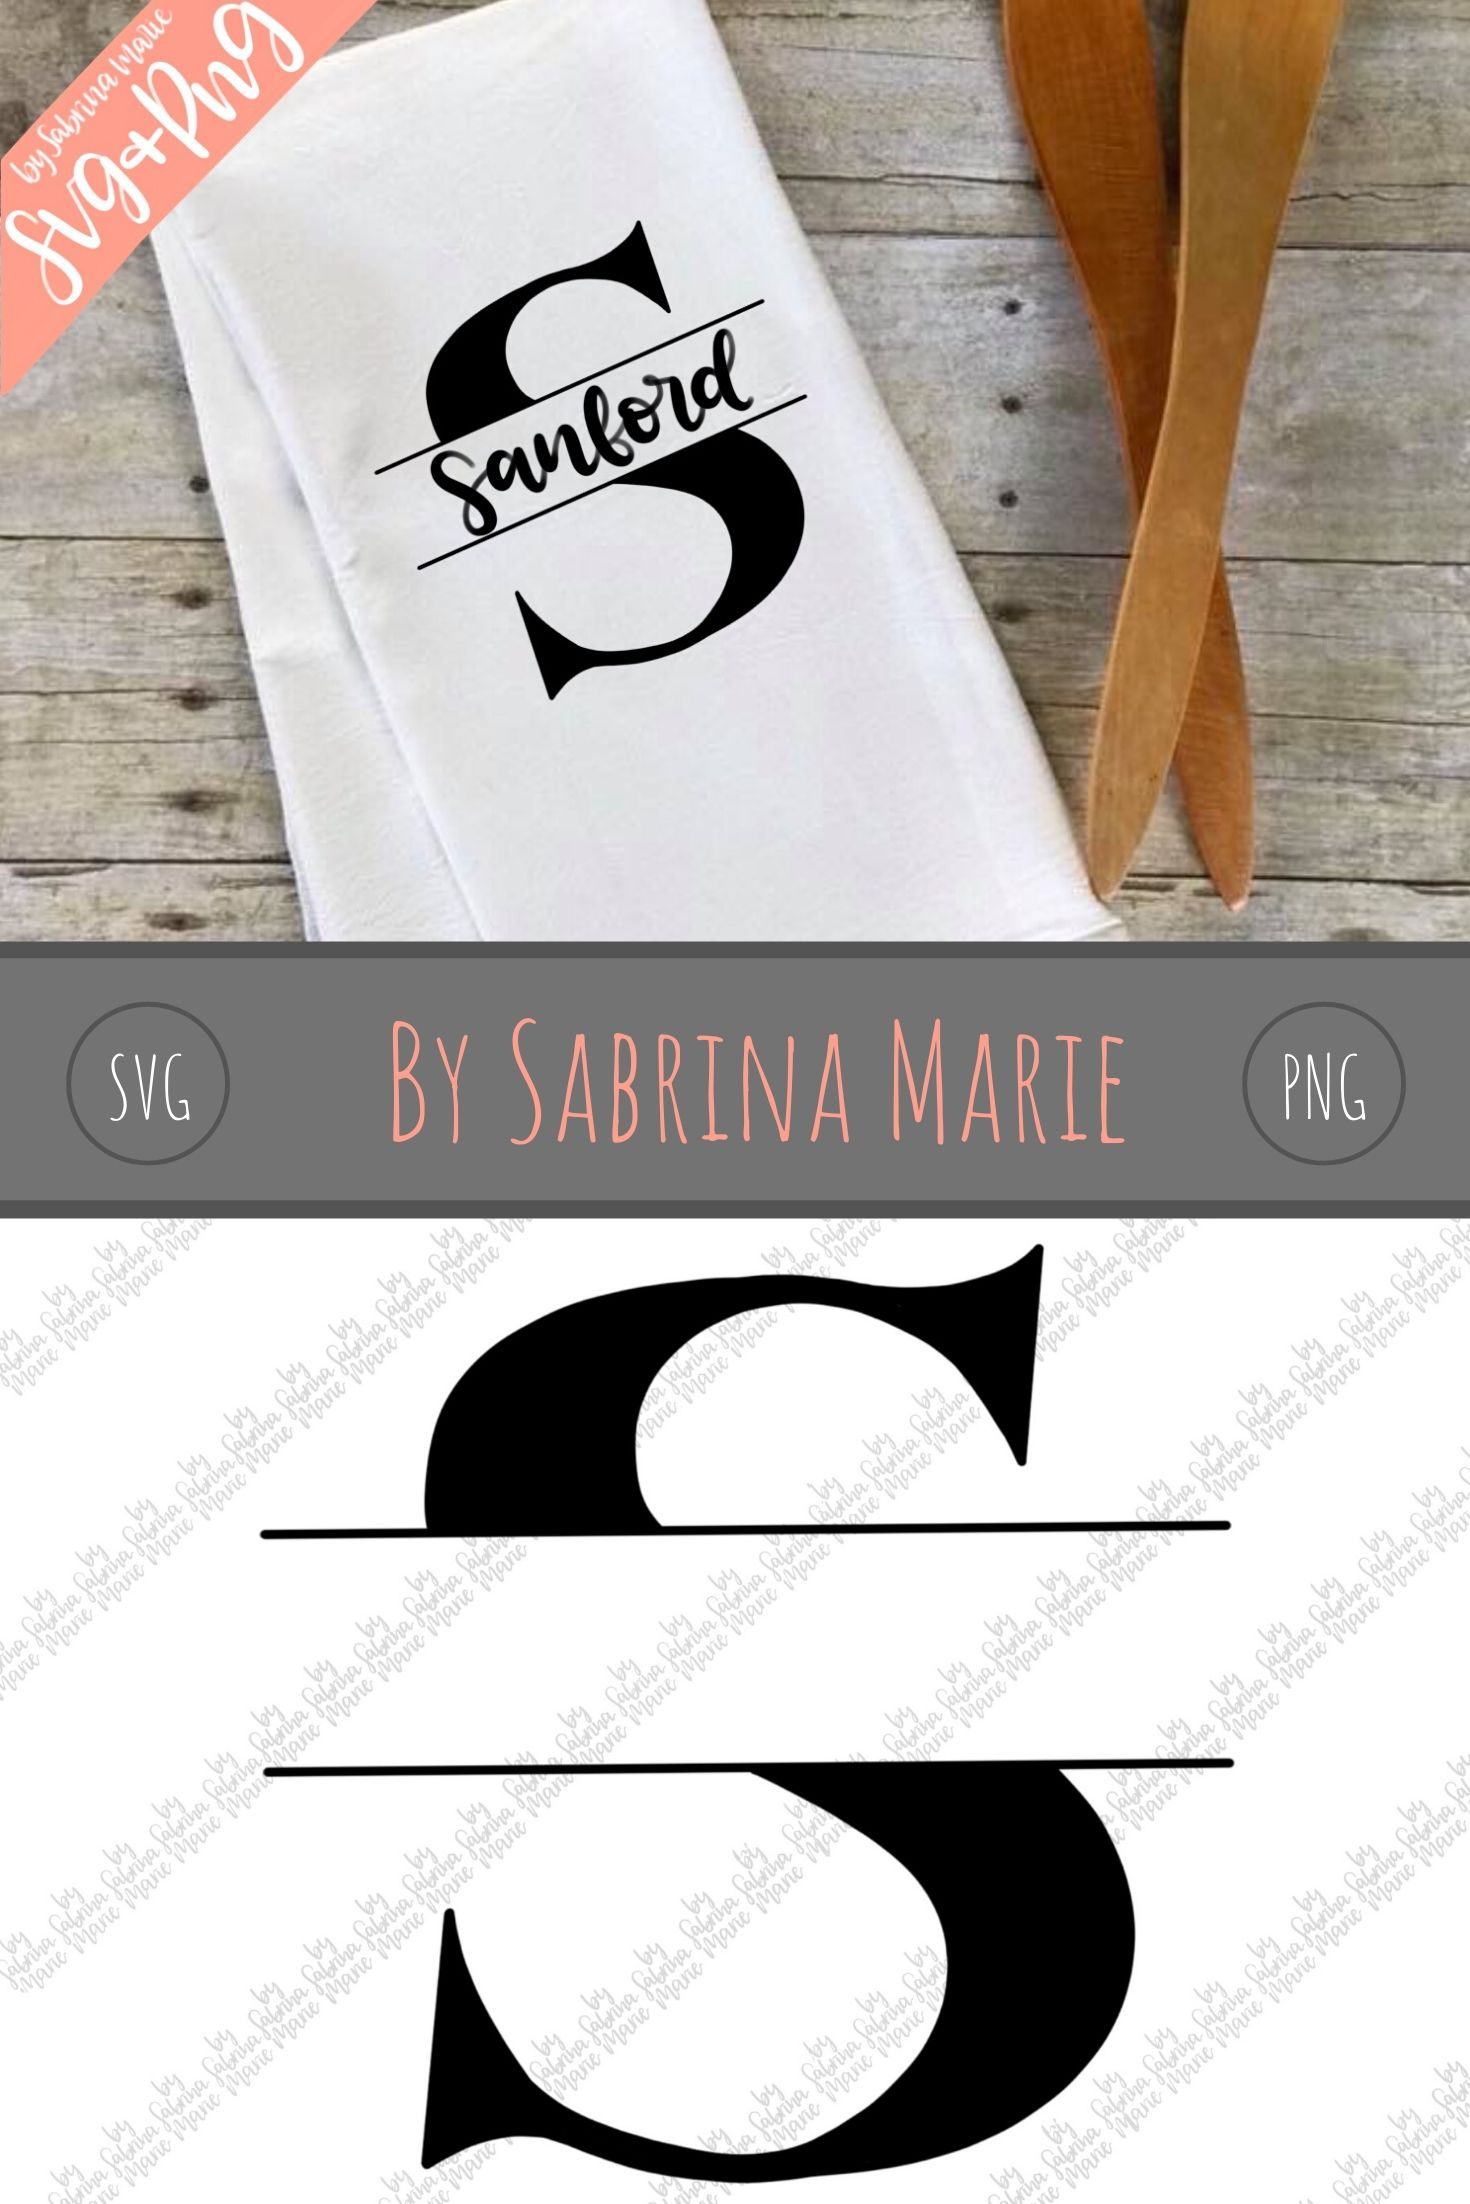 Split Monogram S - Handdrawn - SVG/PNG example image 3